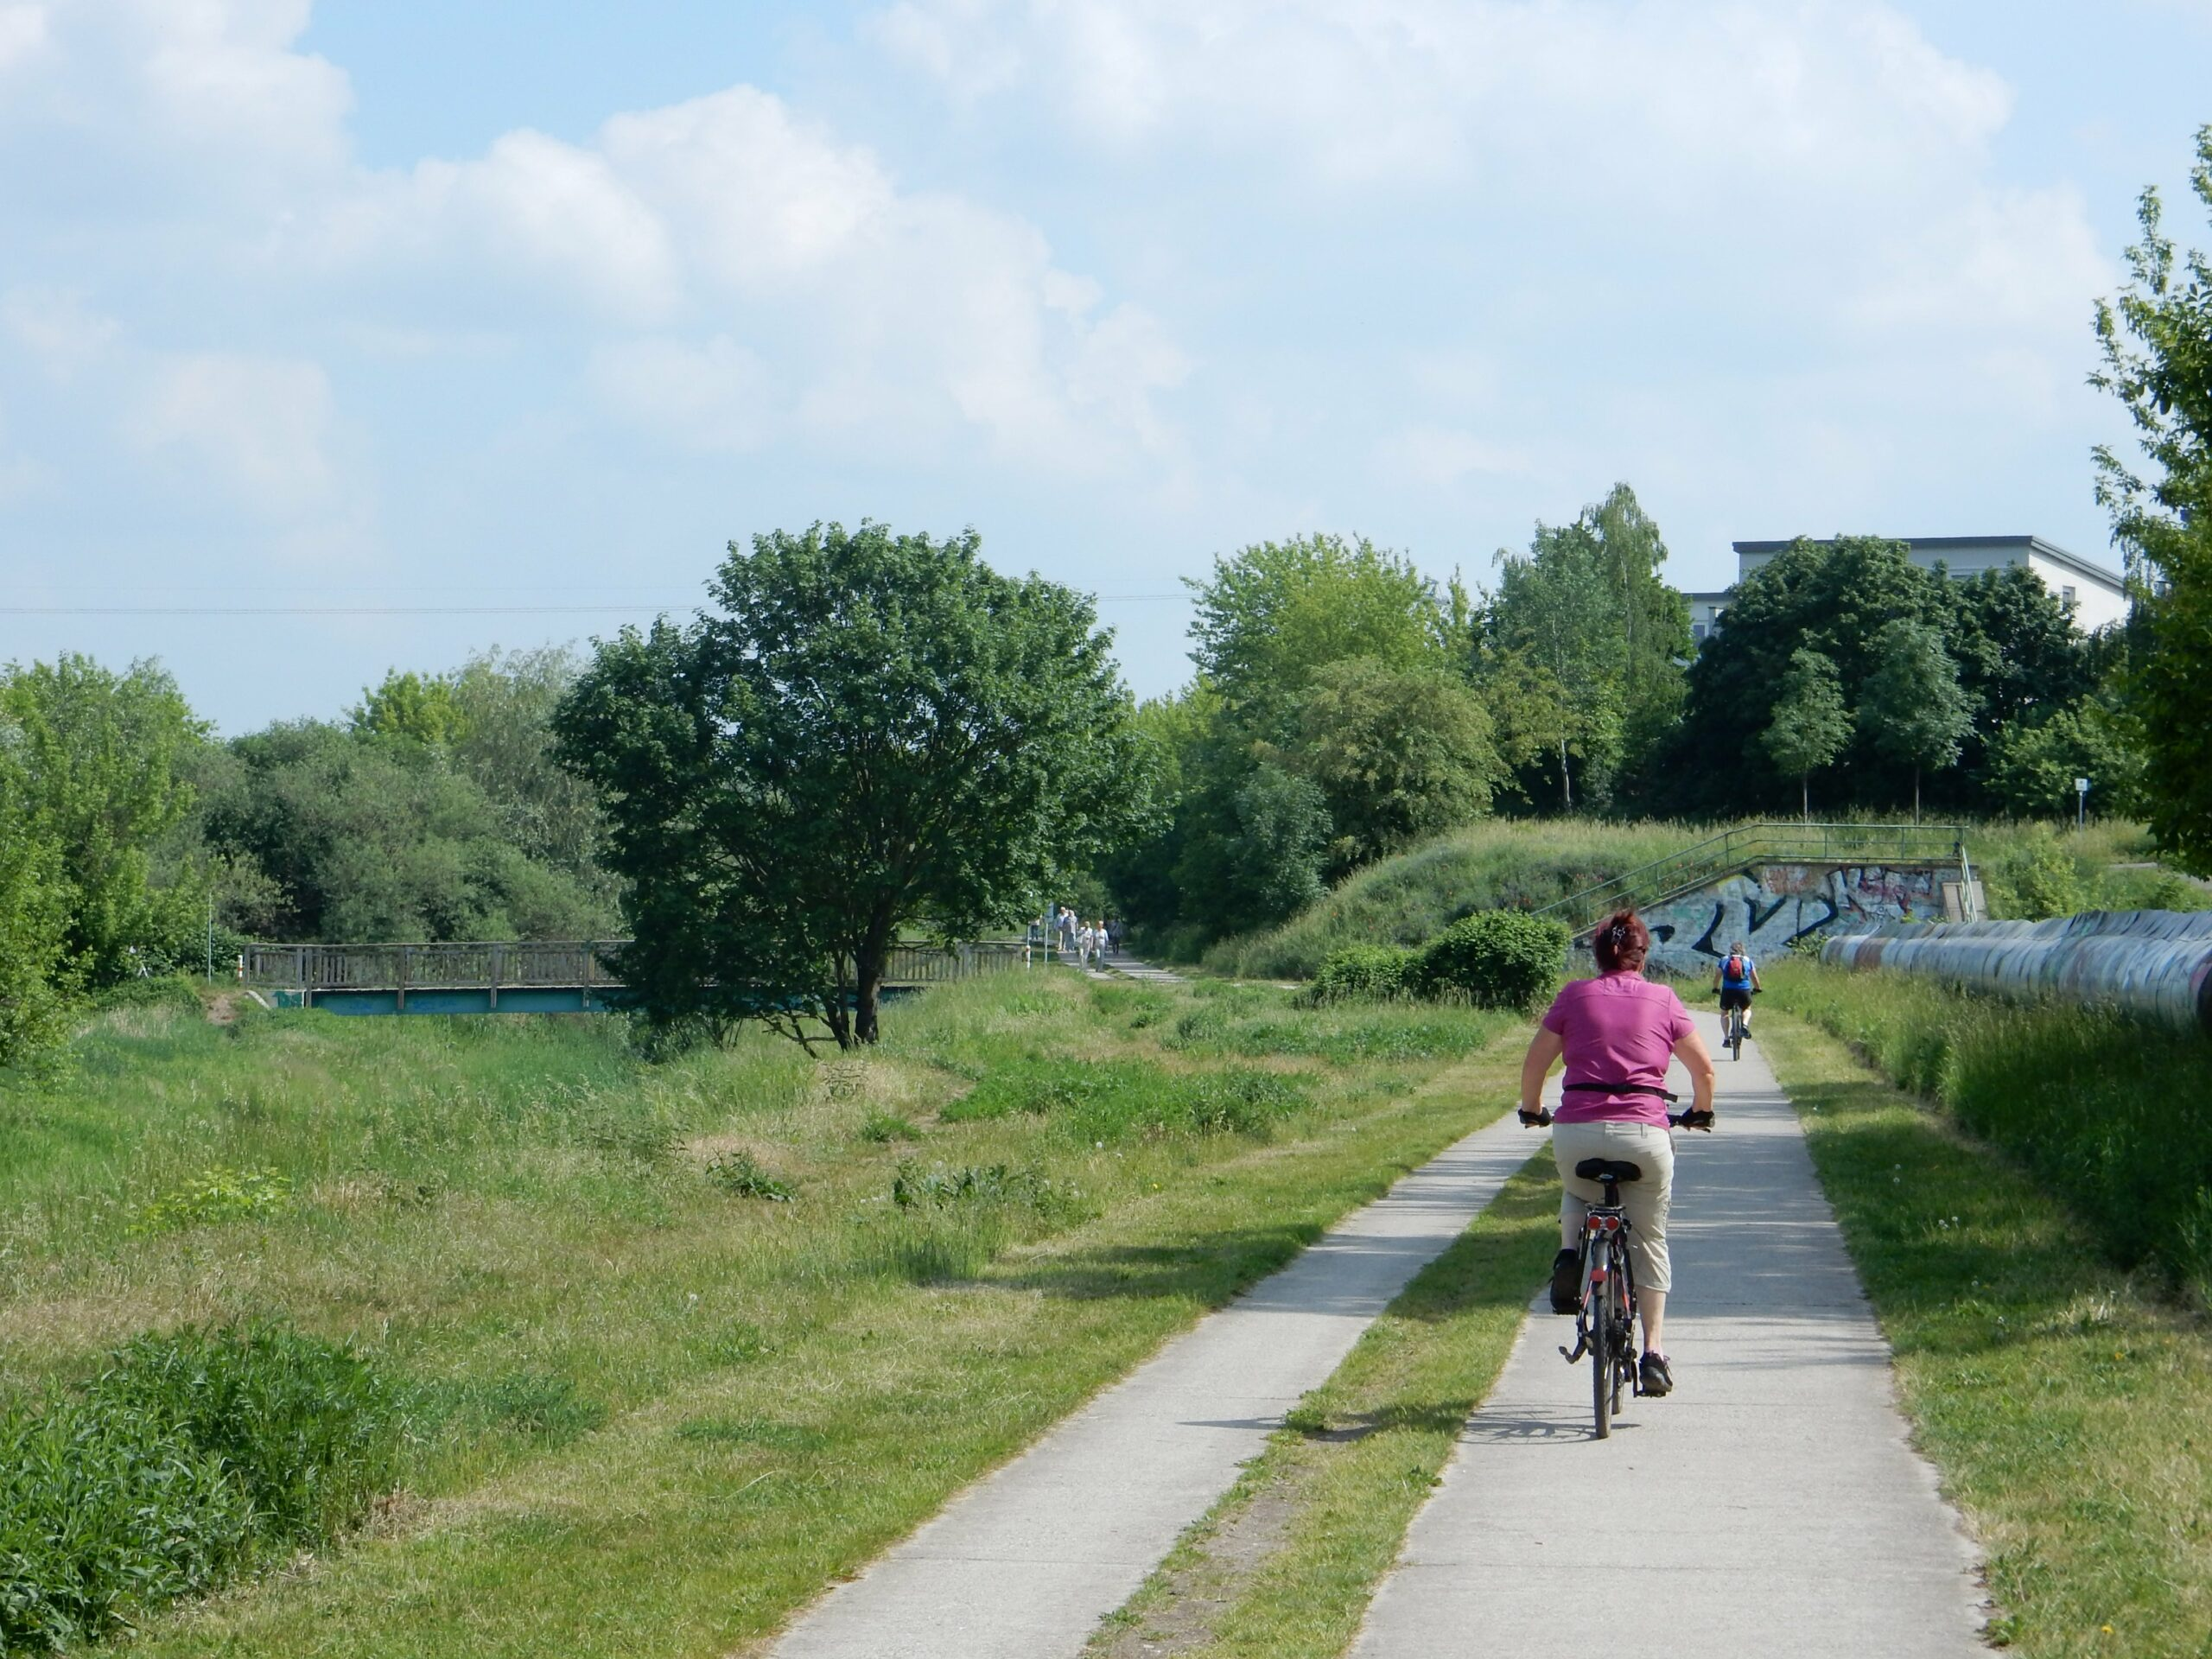 Radtour entlang der Wuhle